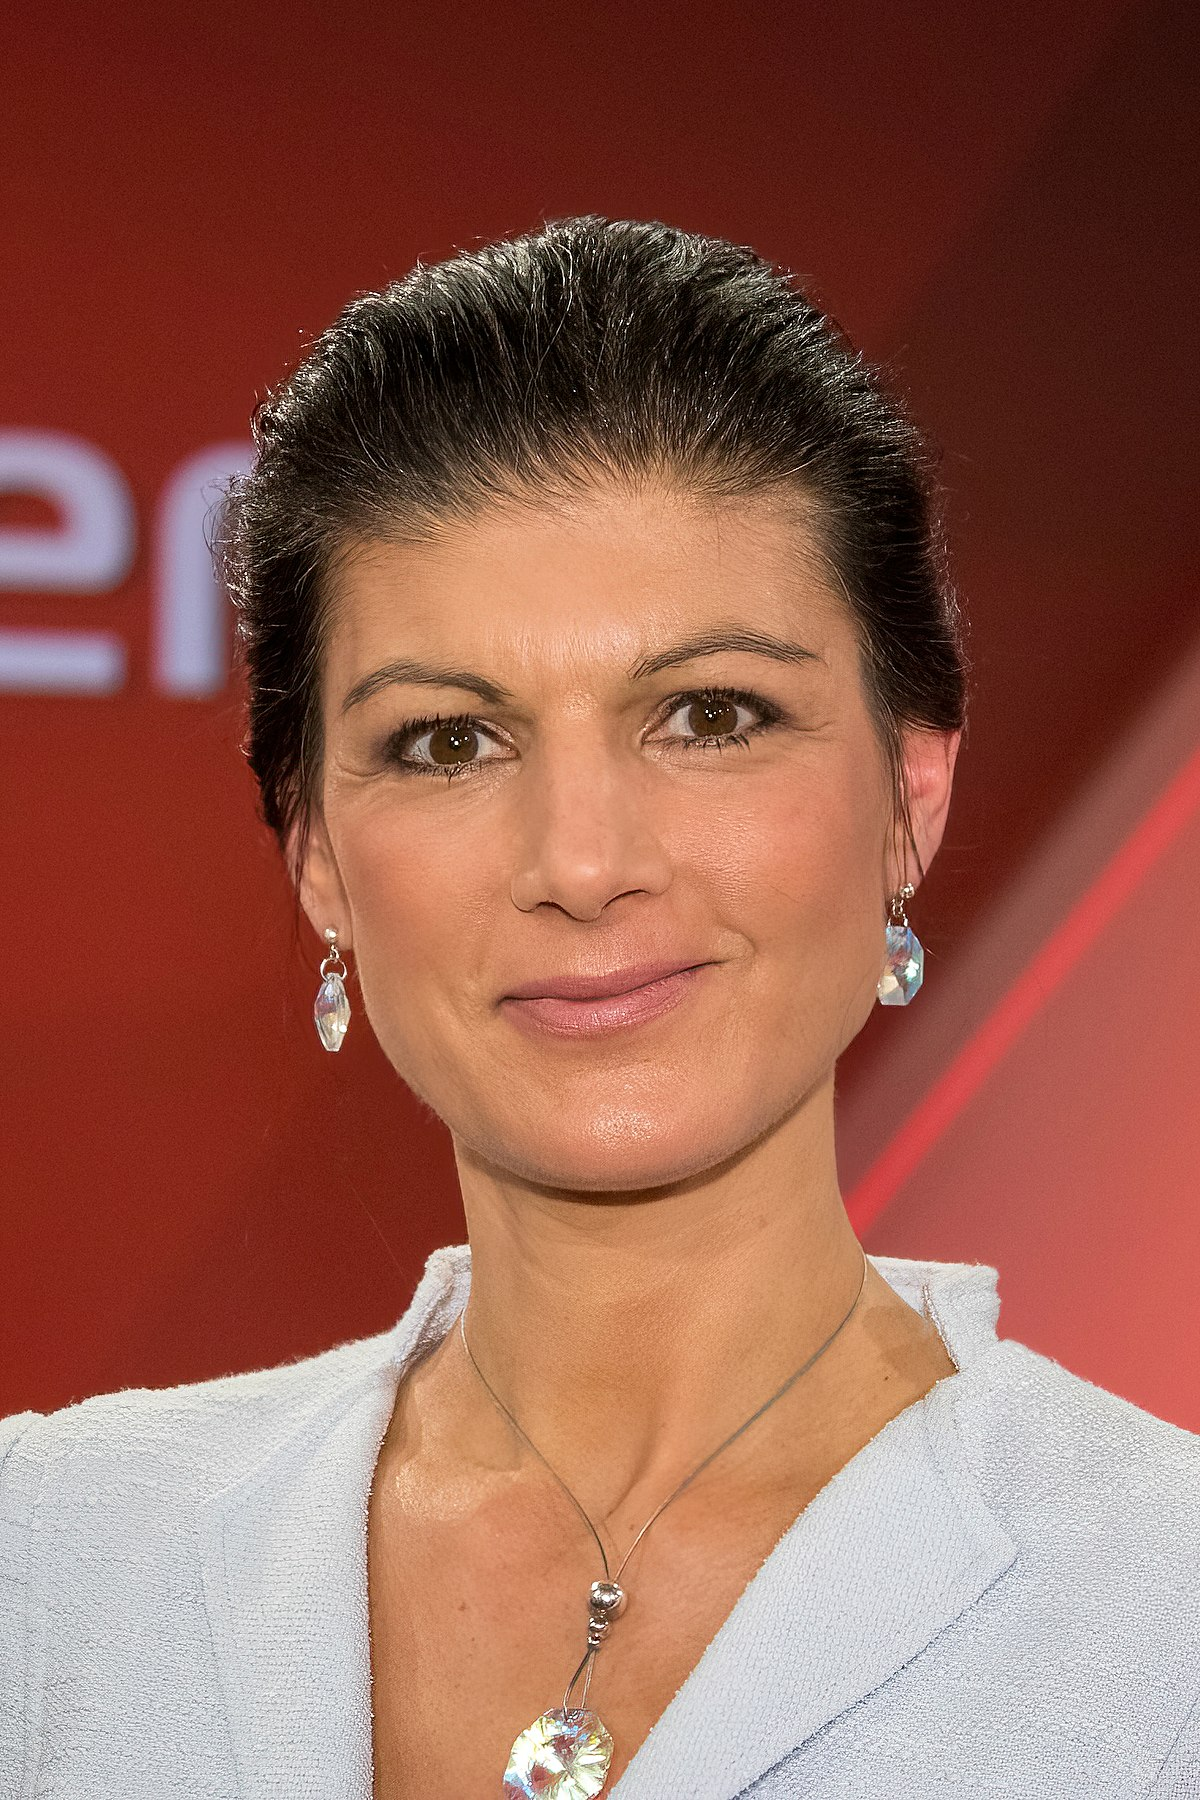 Sahra Wagenknecht - Wikipedia